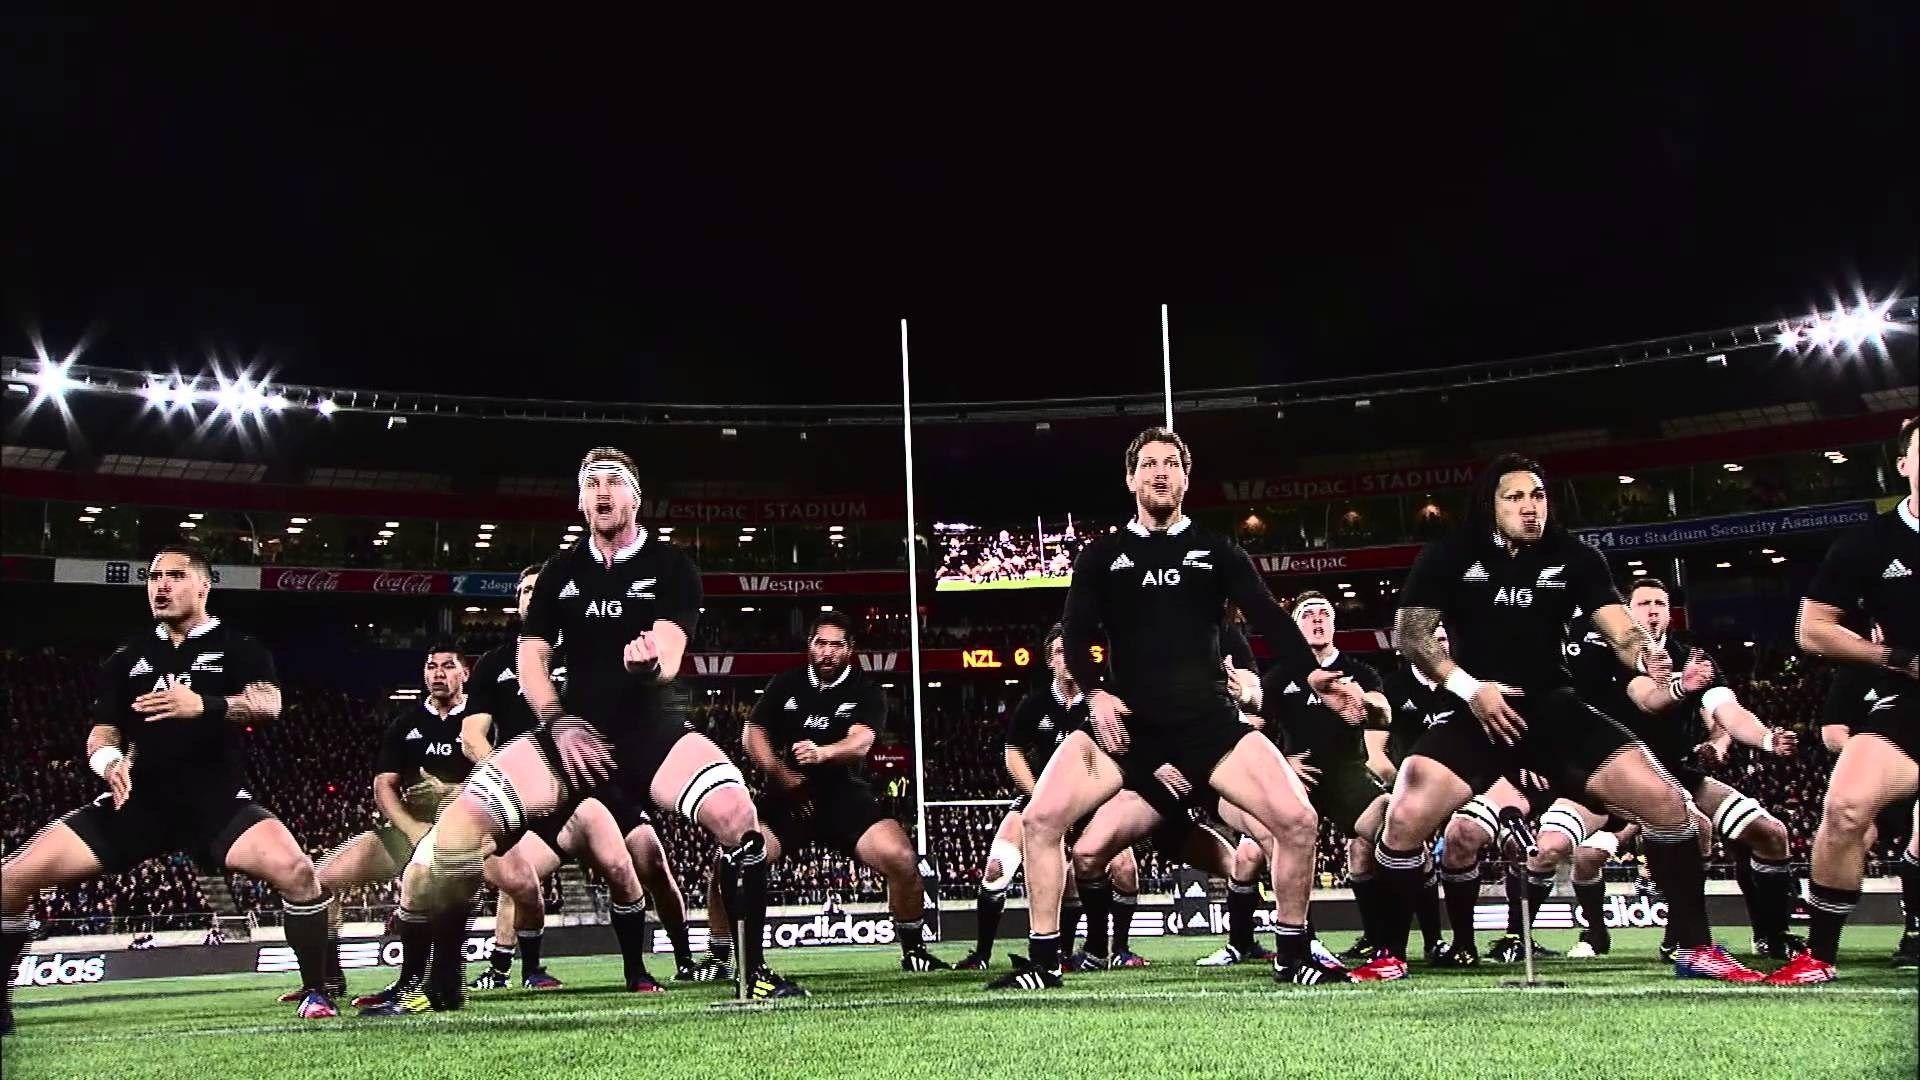 New Zealand All Blacks All Blacks Black Hd Wallpaper All Blacks Rugby